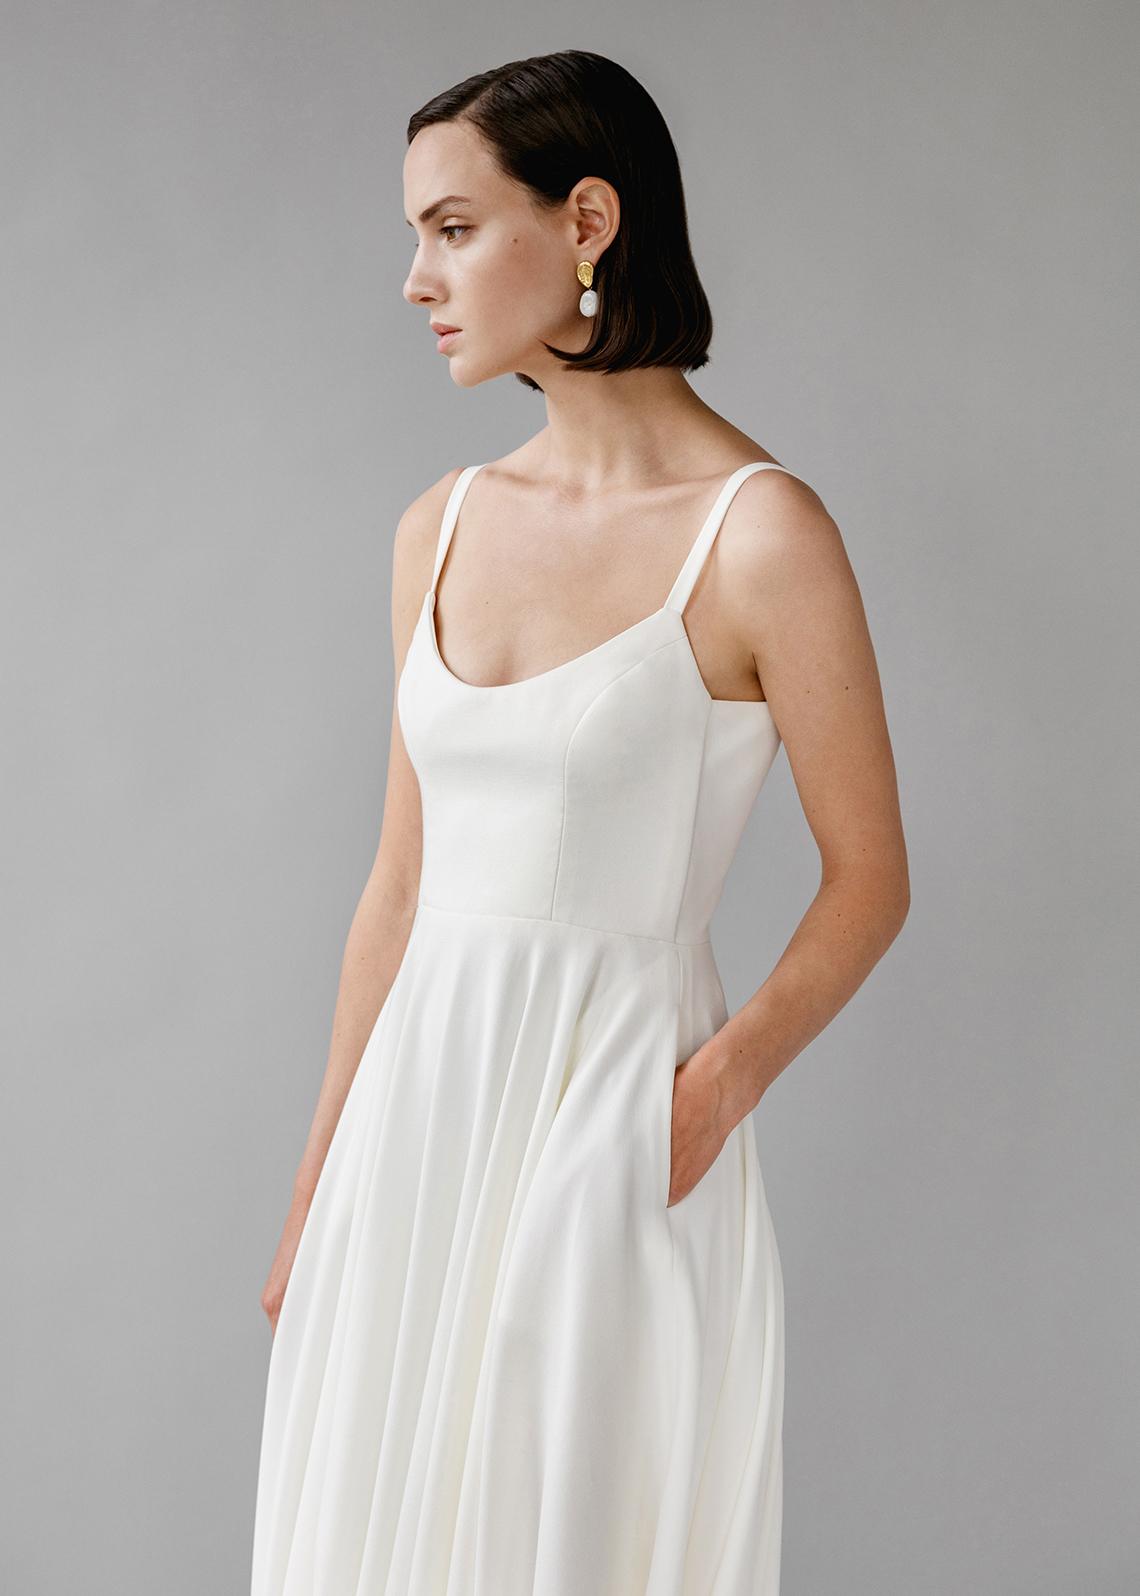 Modern Minimalist 2021 Wedding Dresses by Aesling Bride – Felicity Dress 5